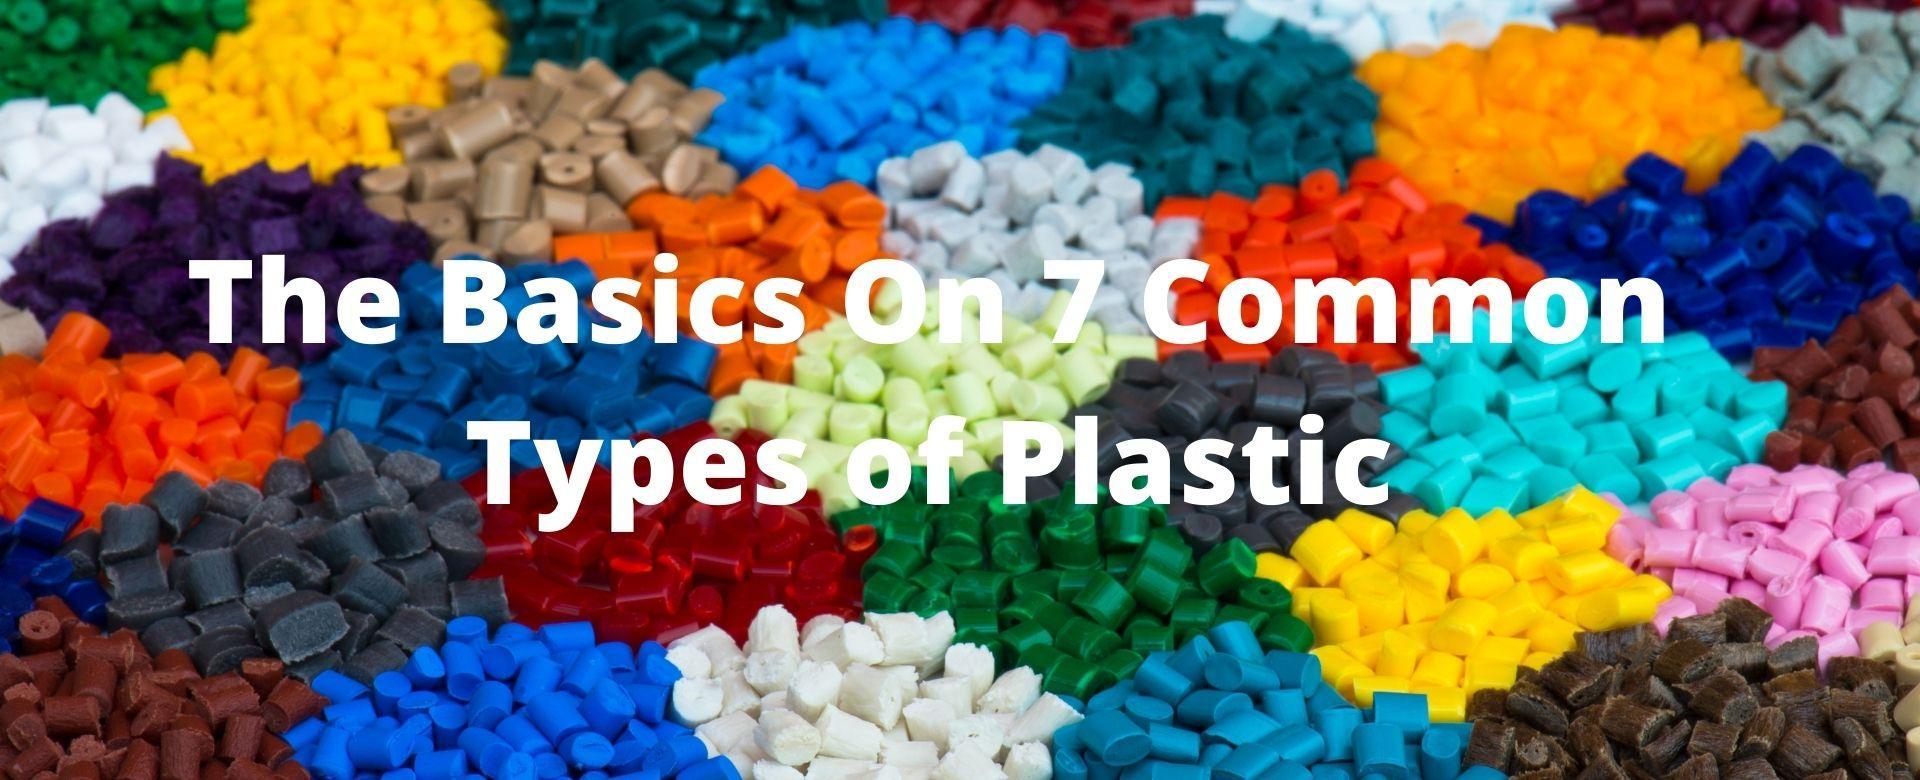 The Basics On 7 Common Types of Plastic